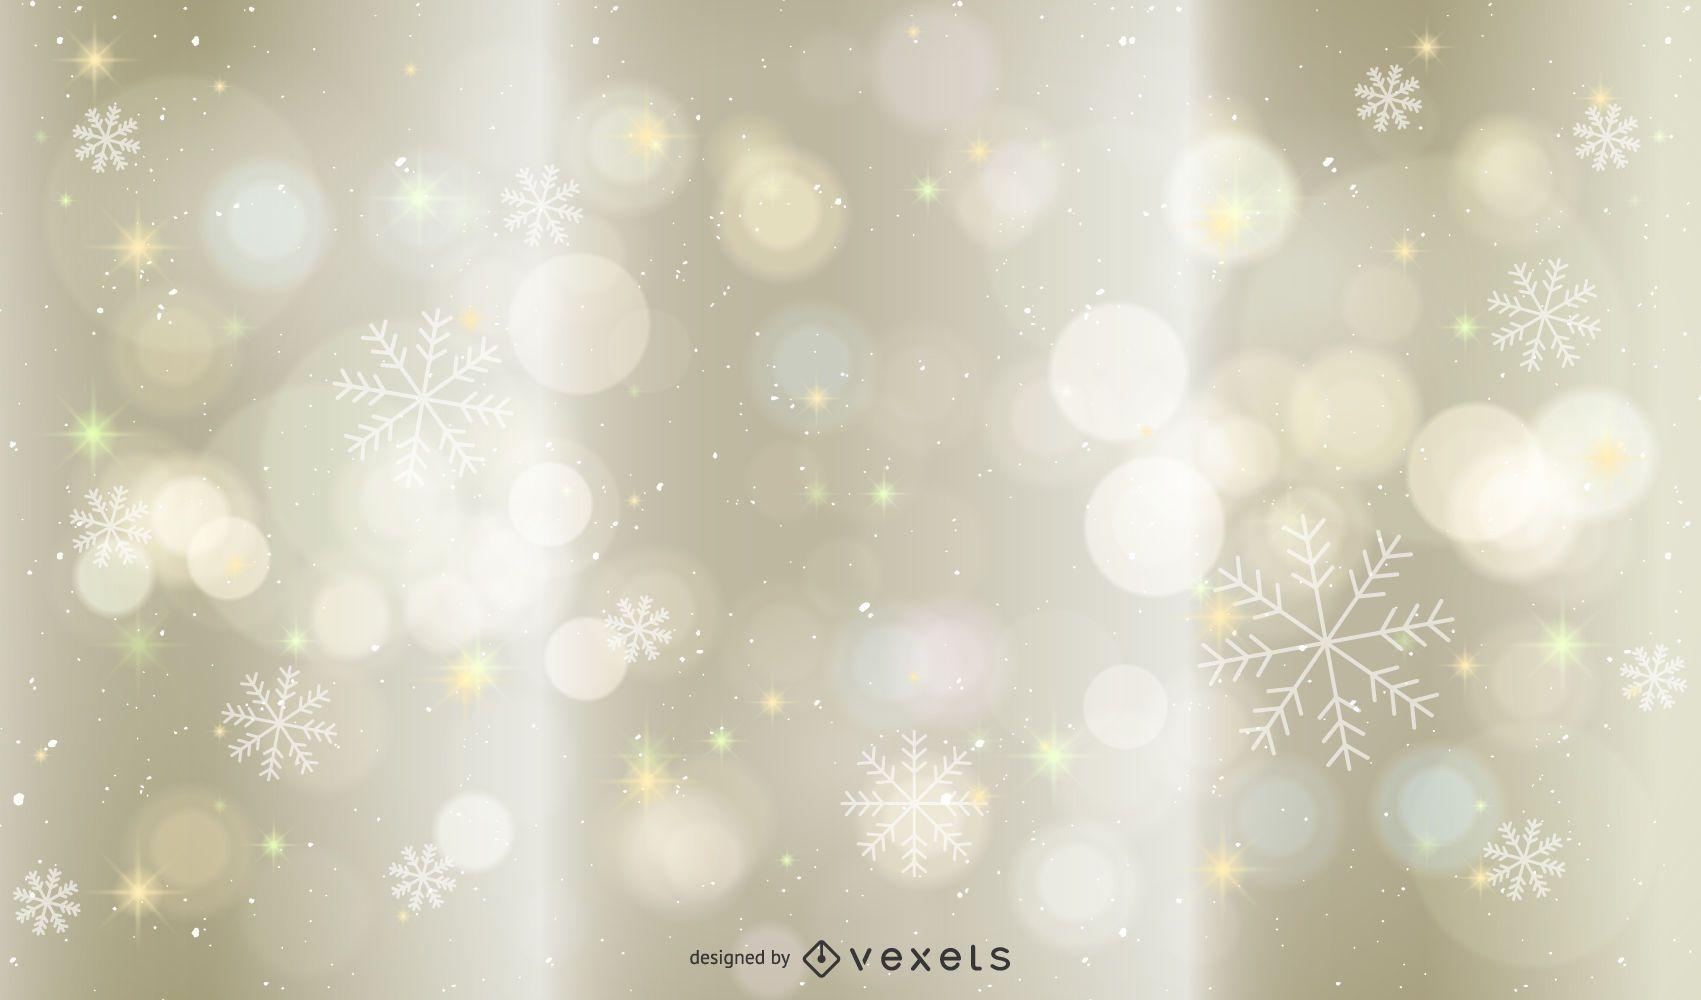 Sparkling Festive Background